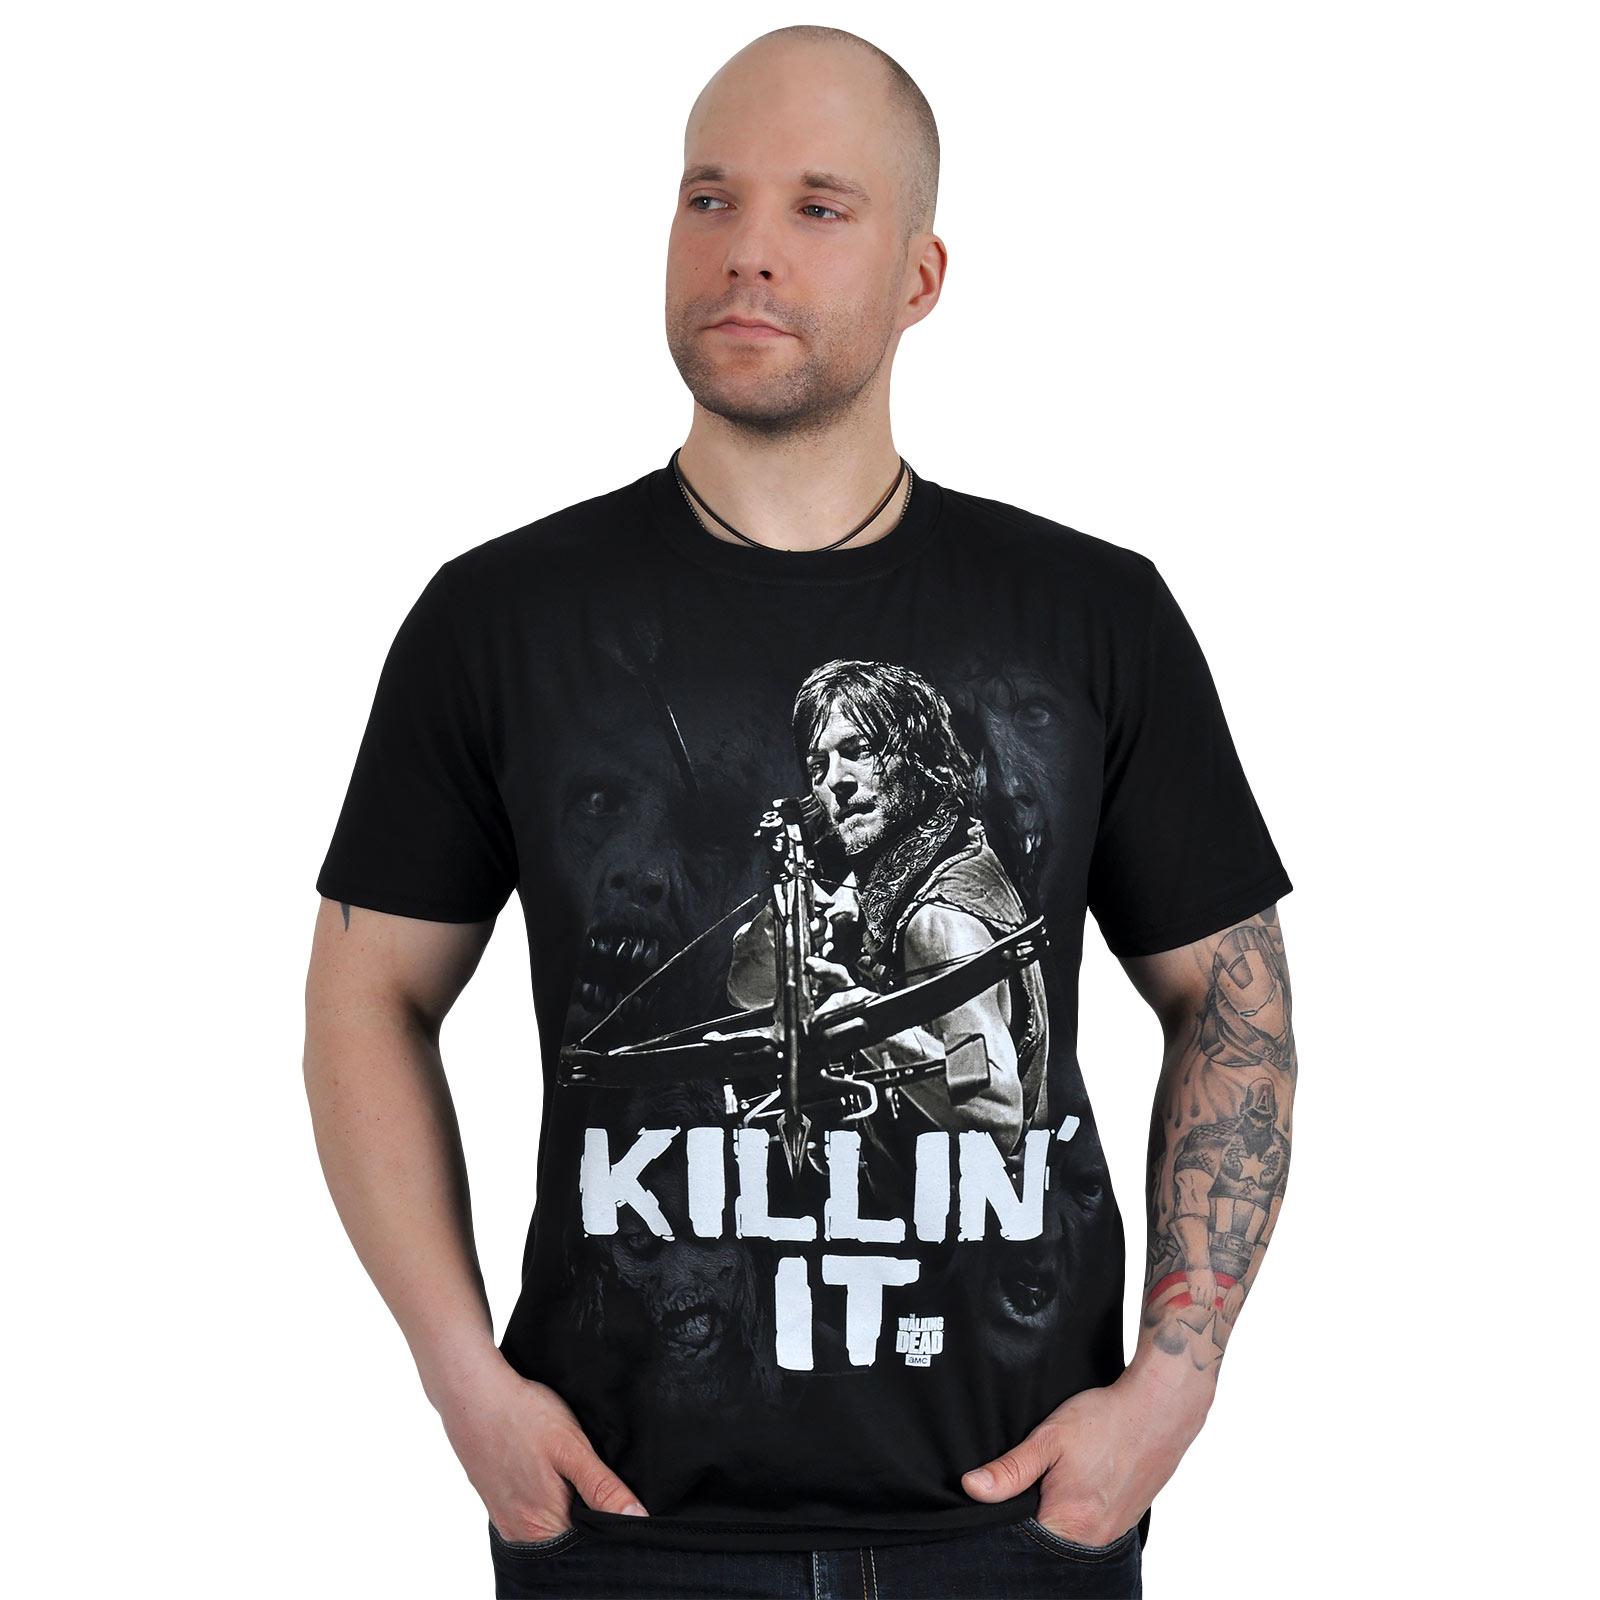 Walking Dead - Killin'It T-Shirt